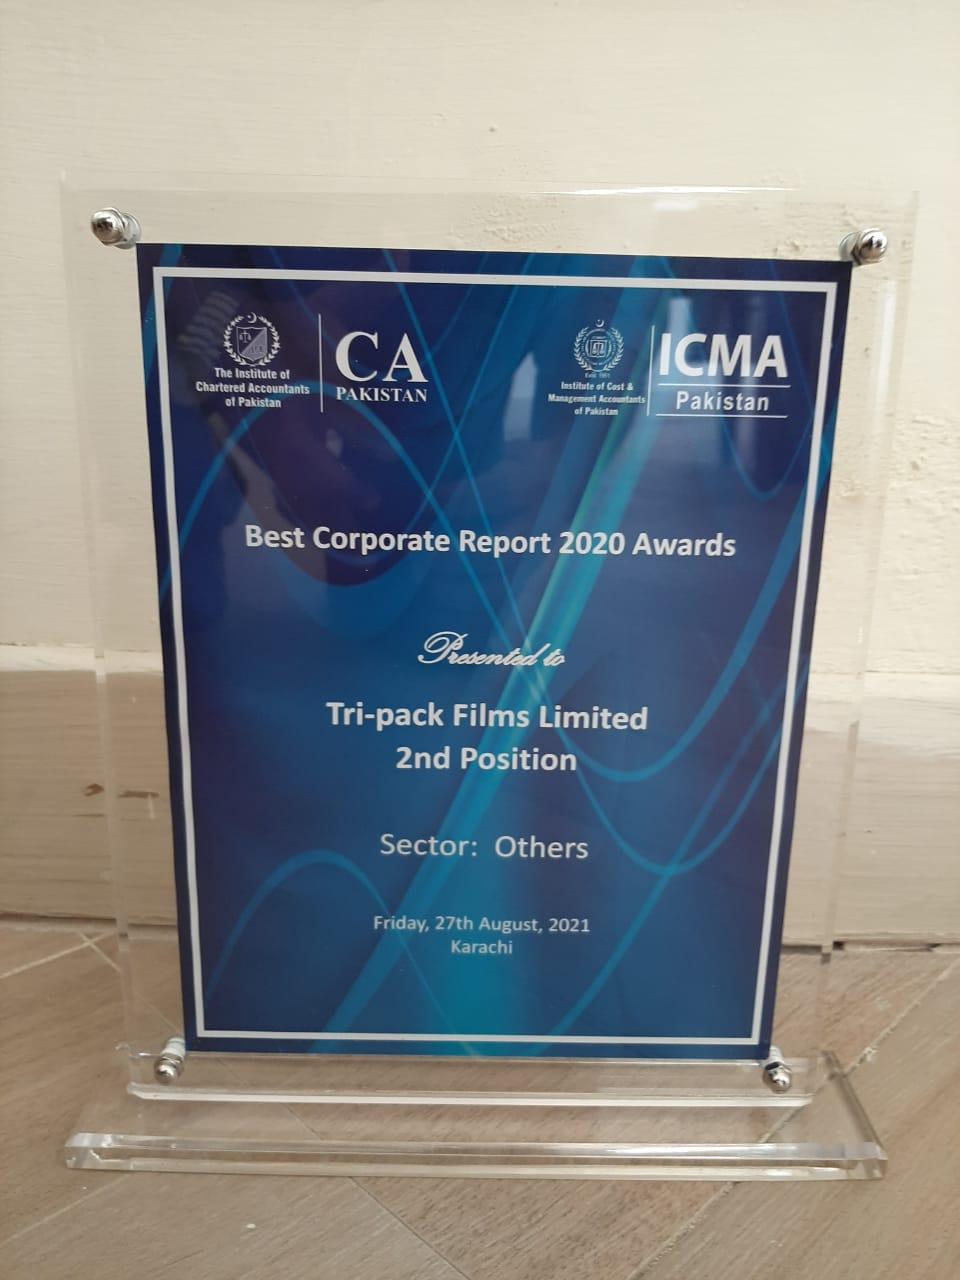 Best Corporate Reporting Award 2020